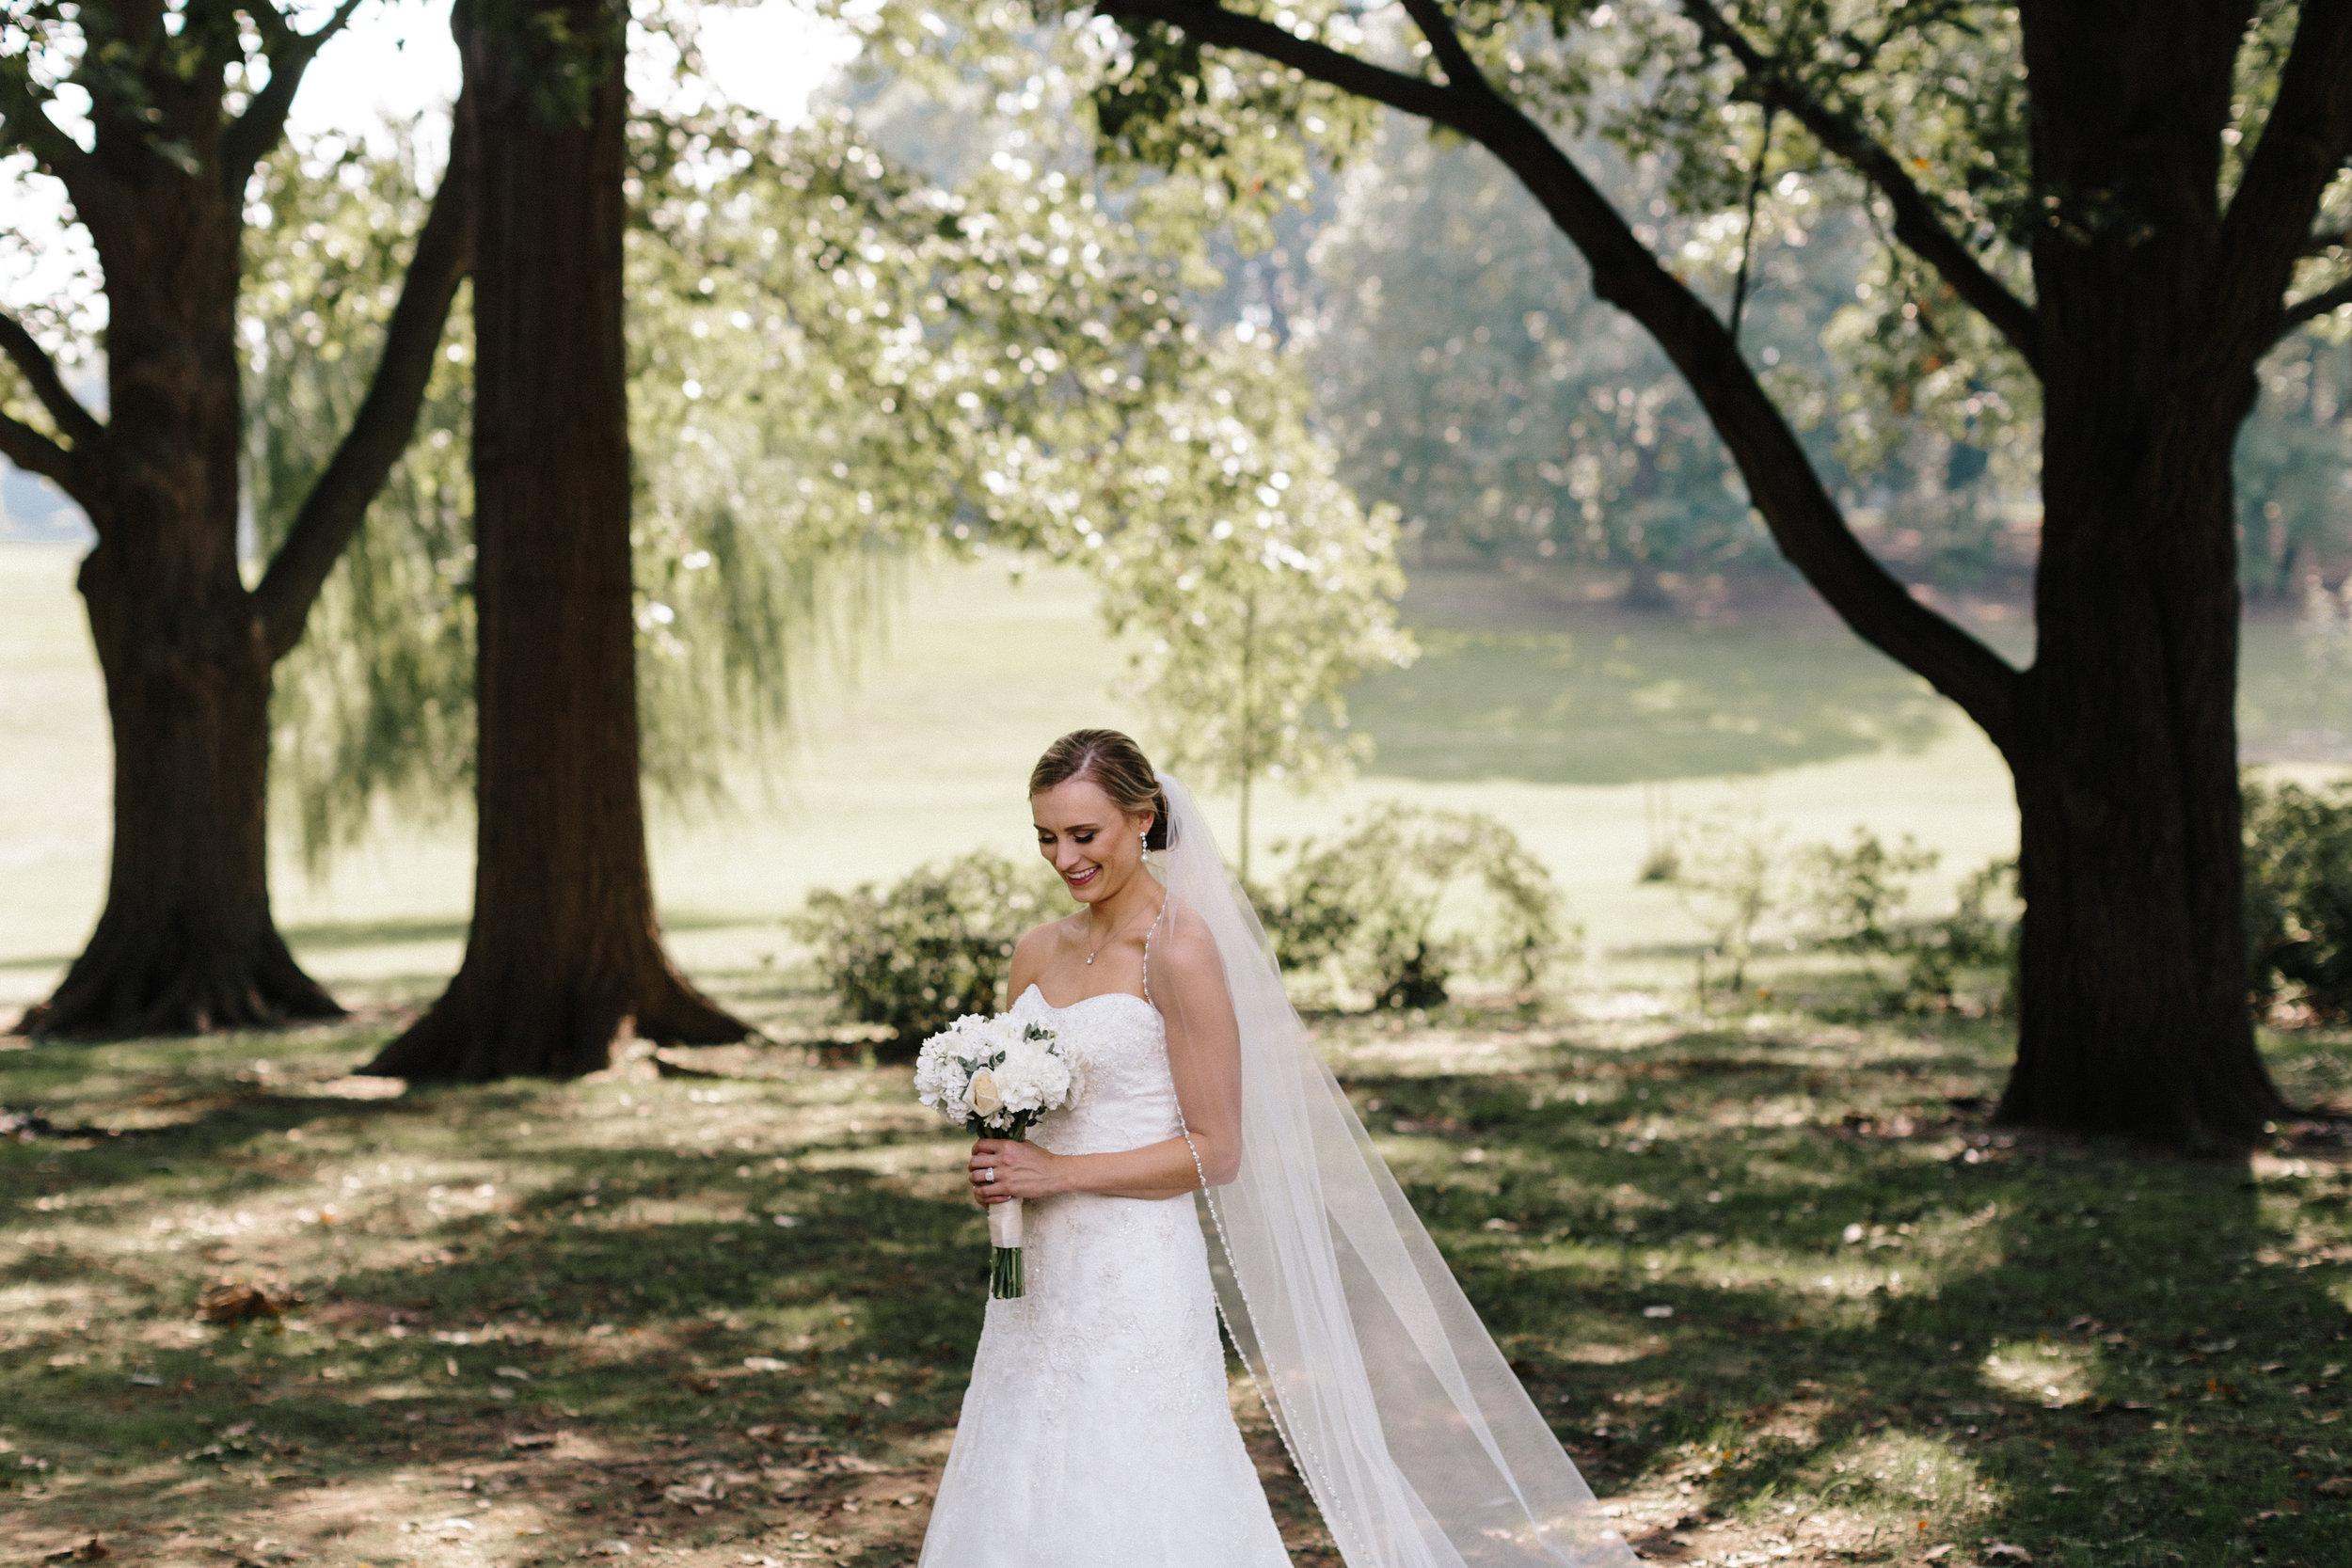 alyssa barletter photography kansas city wedding photographer katie and kendall-34.jpg